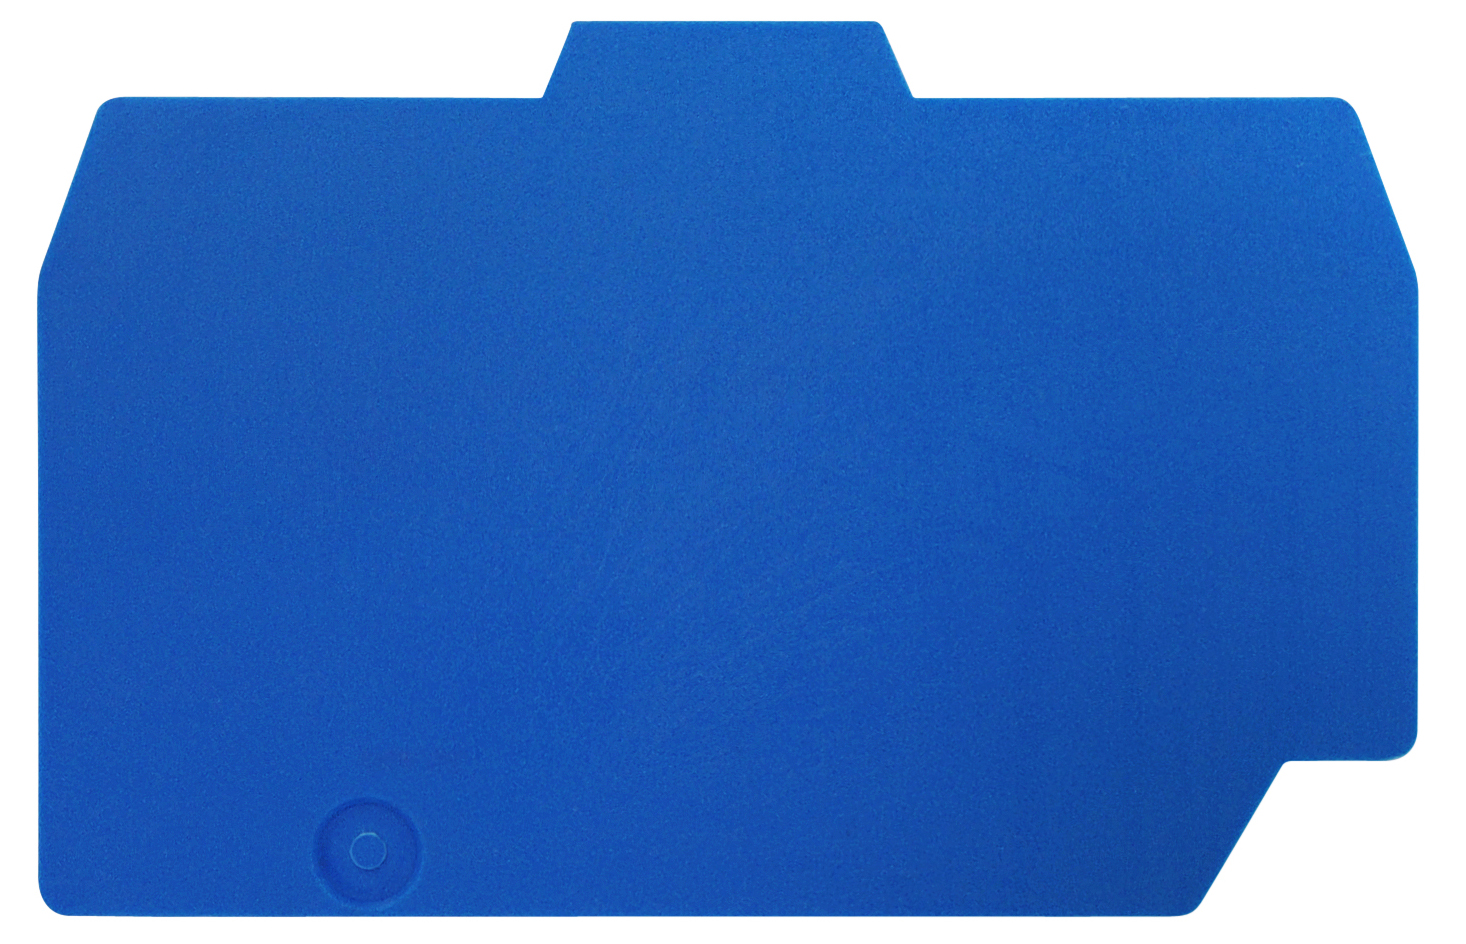 1 Stk Endplatte für Federkraftklemme HTE 6mm², grün-gelb IK222206--